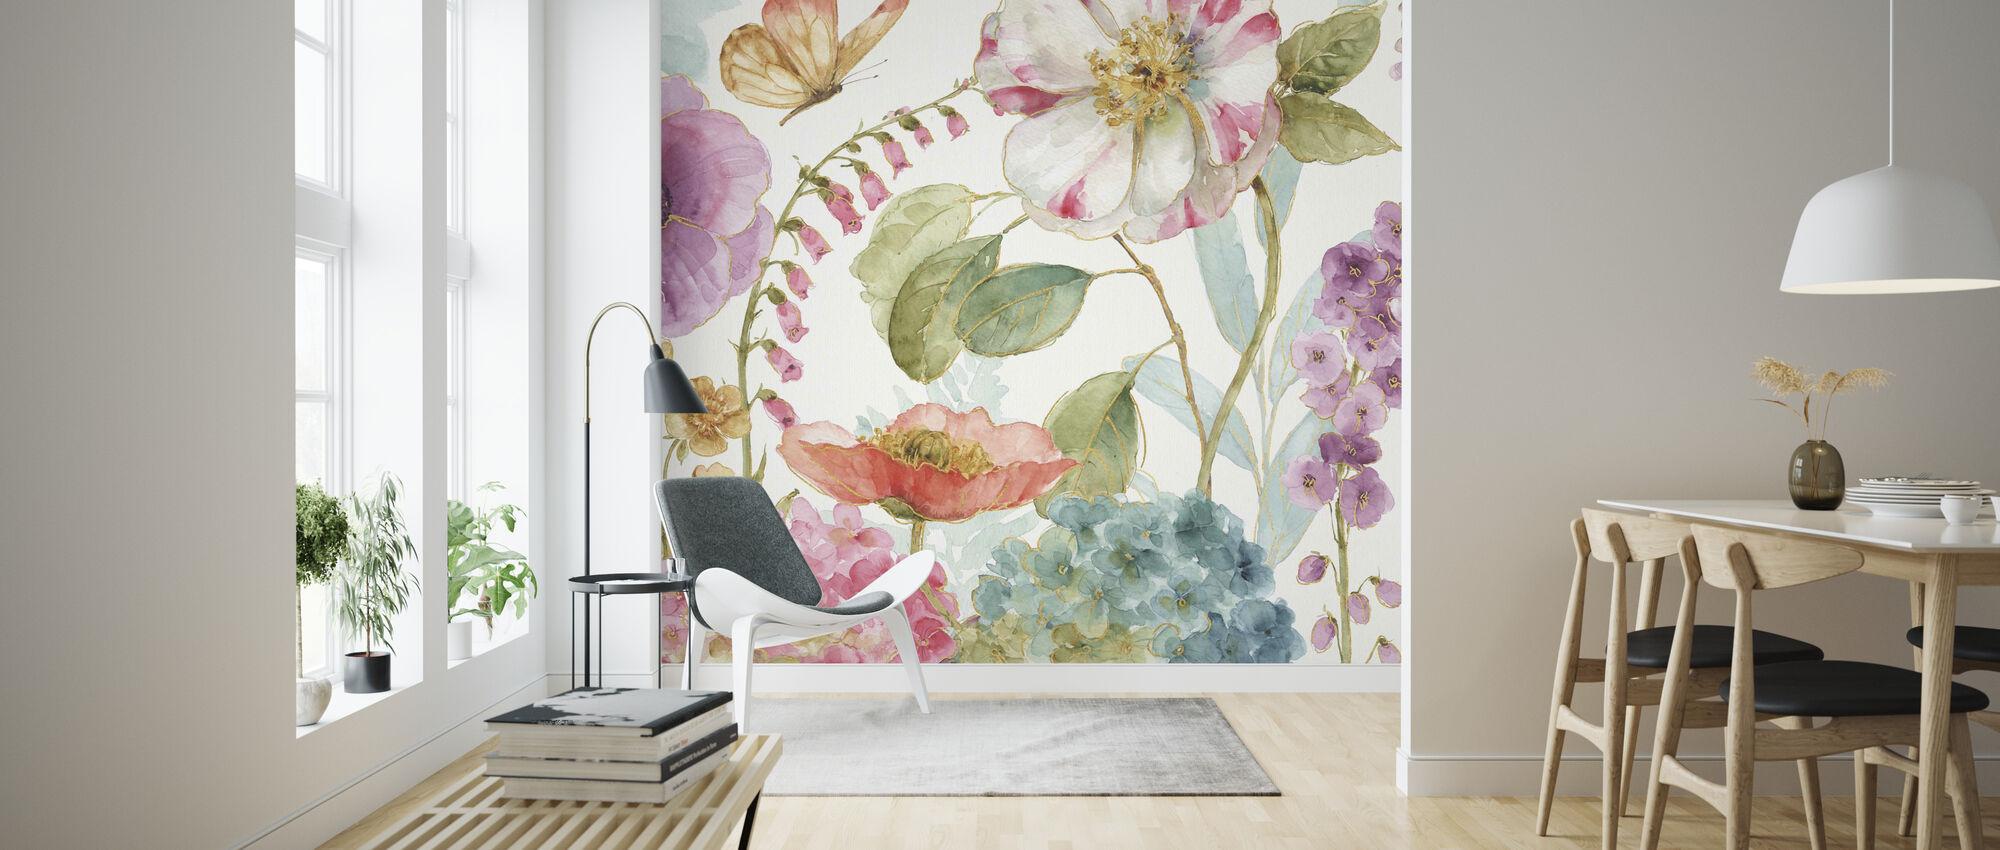 Garden Delight 2 - Wallpaper - Living Room